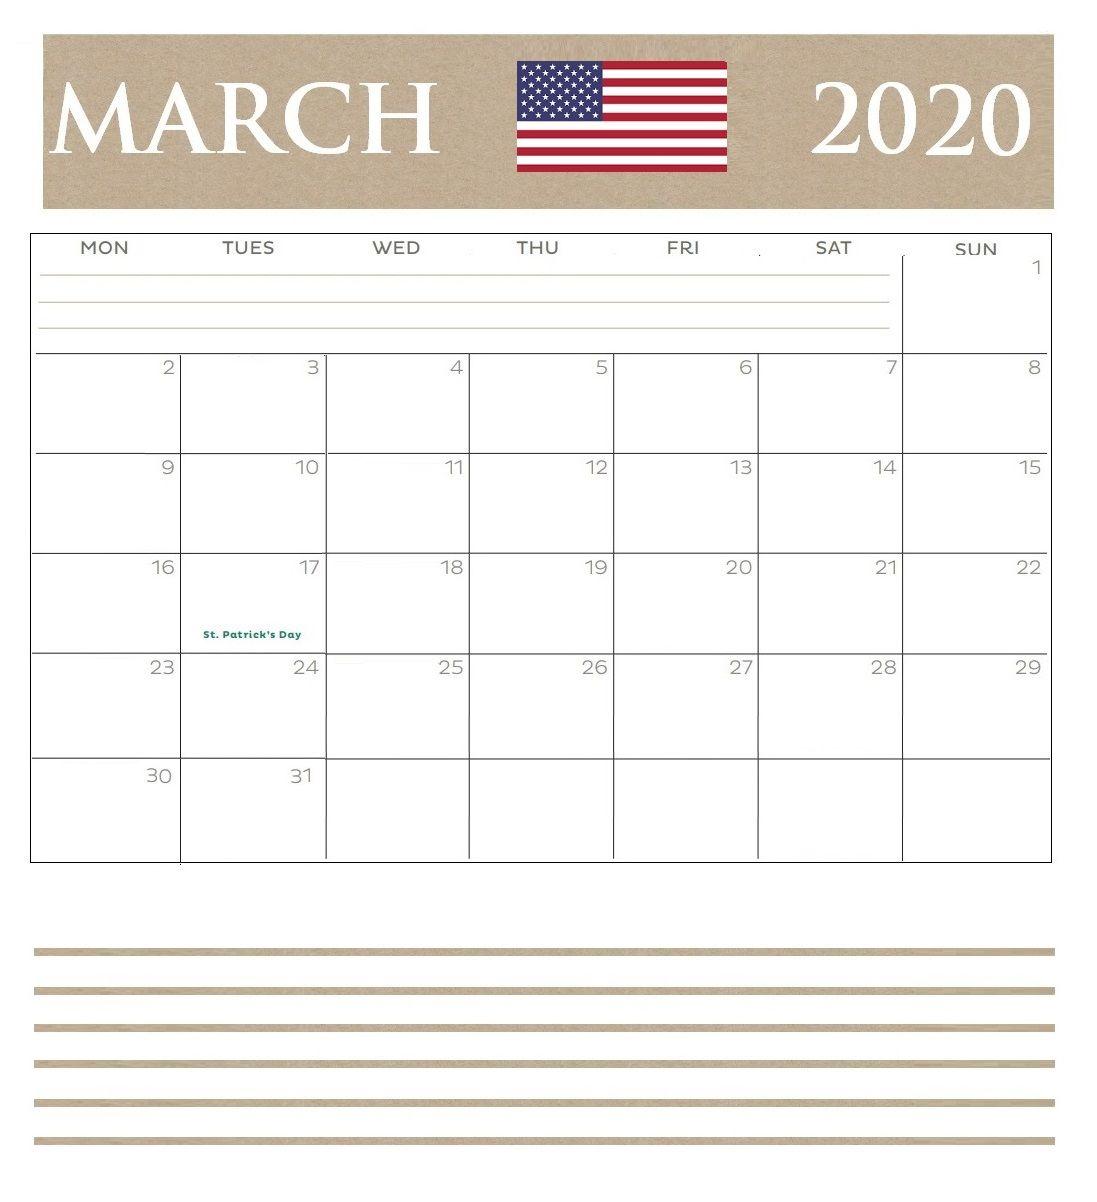 March 2020 Calendar USA Holidays Federal, National, Bank